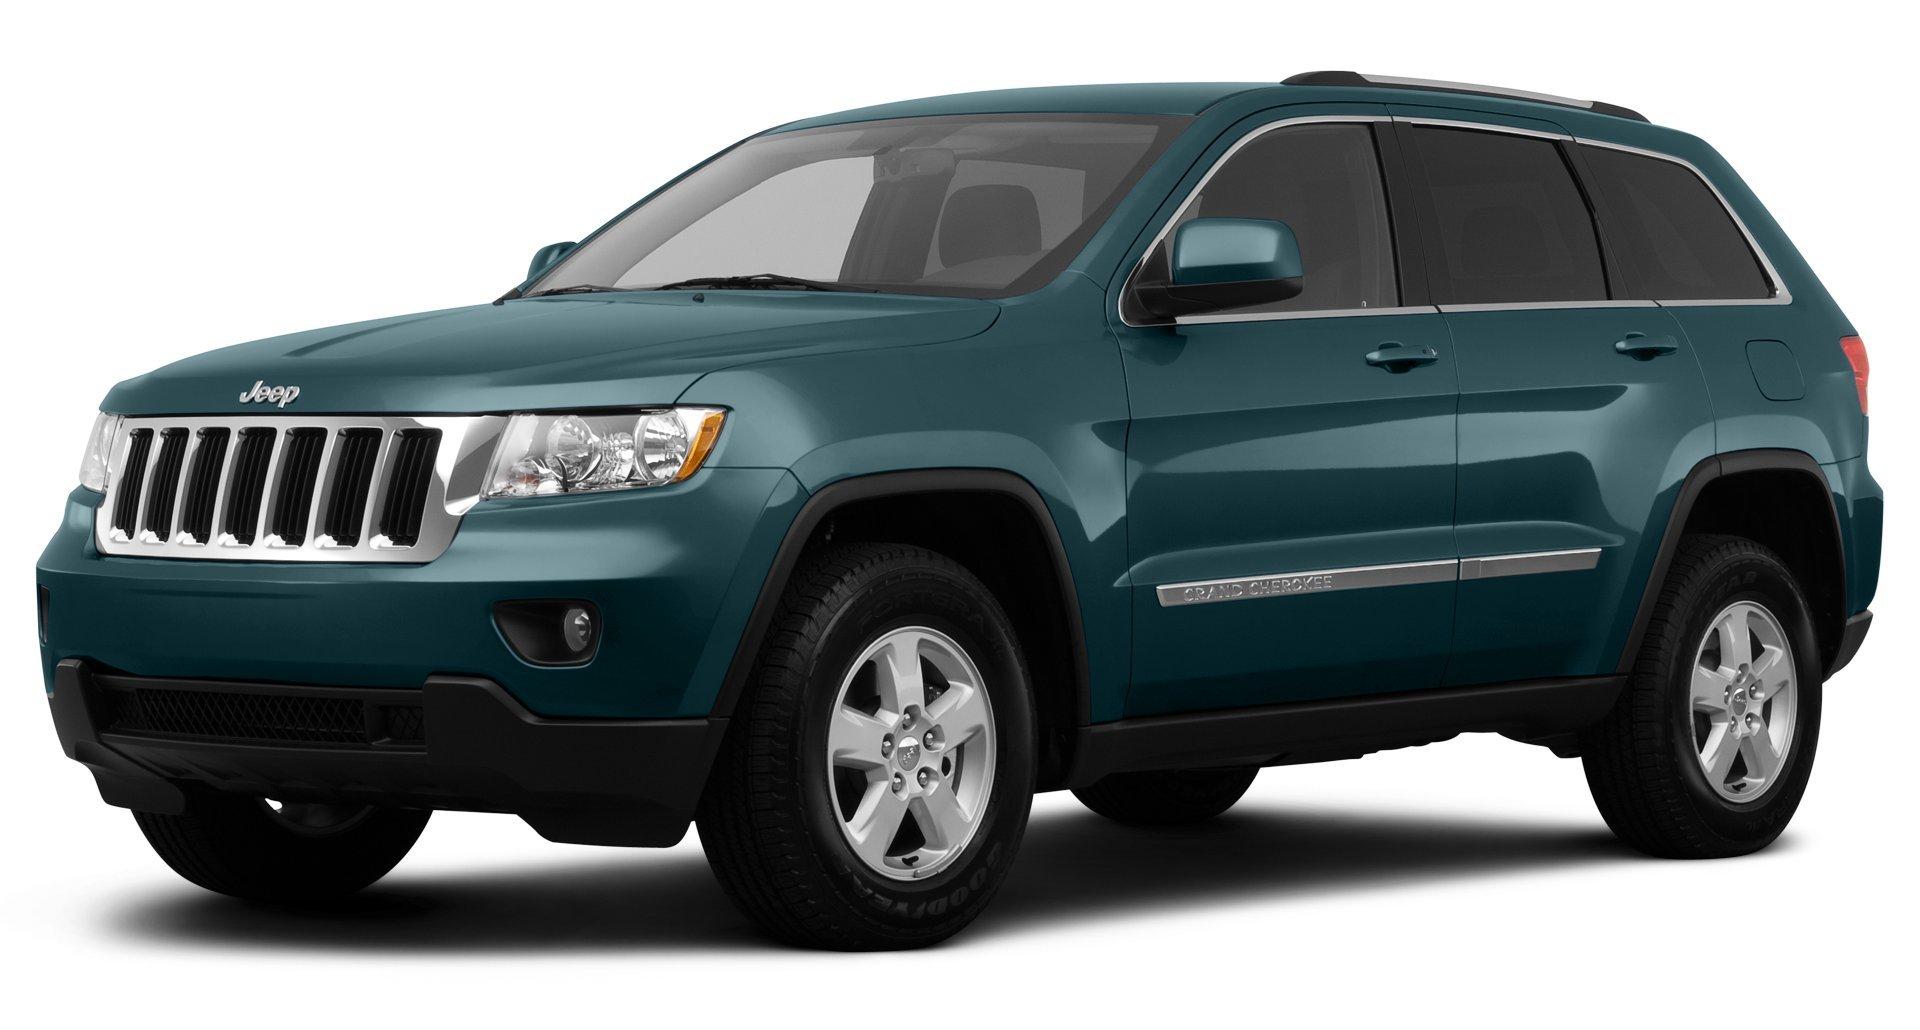 2012 jeep grand cherokee laredo review